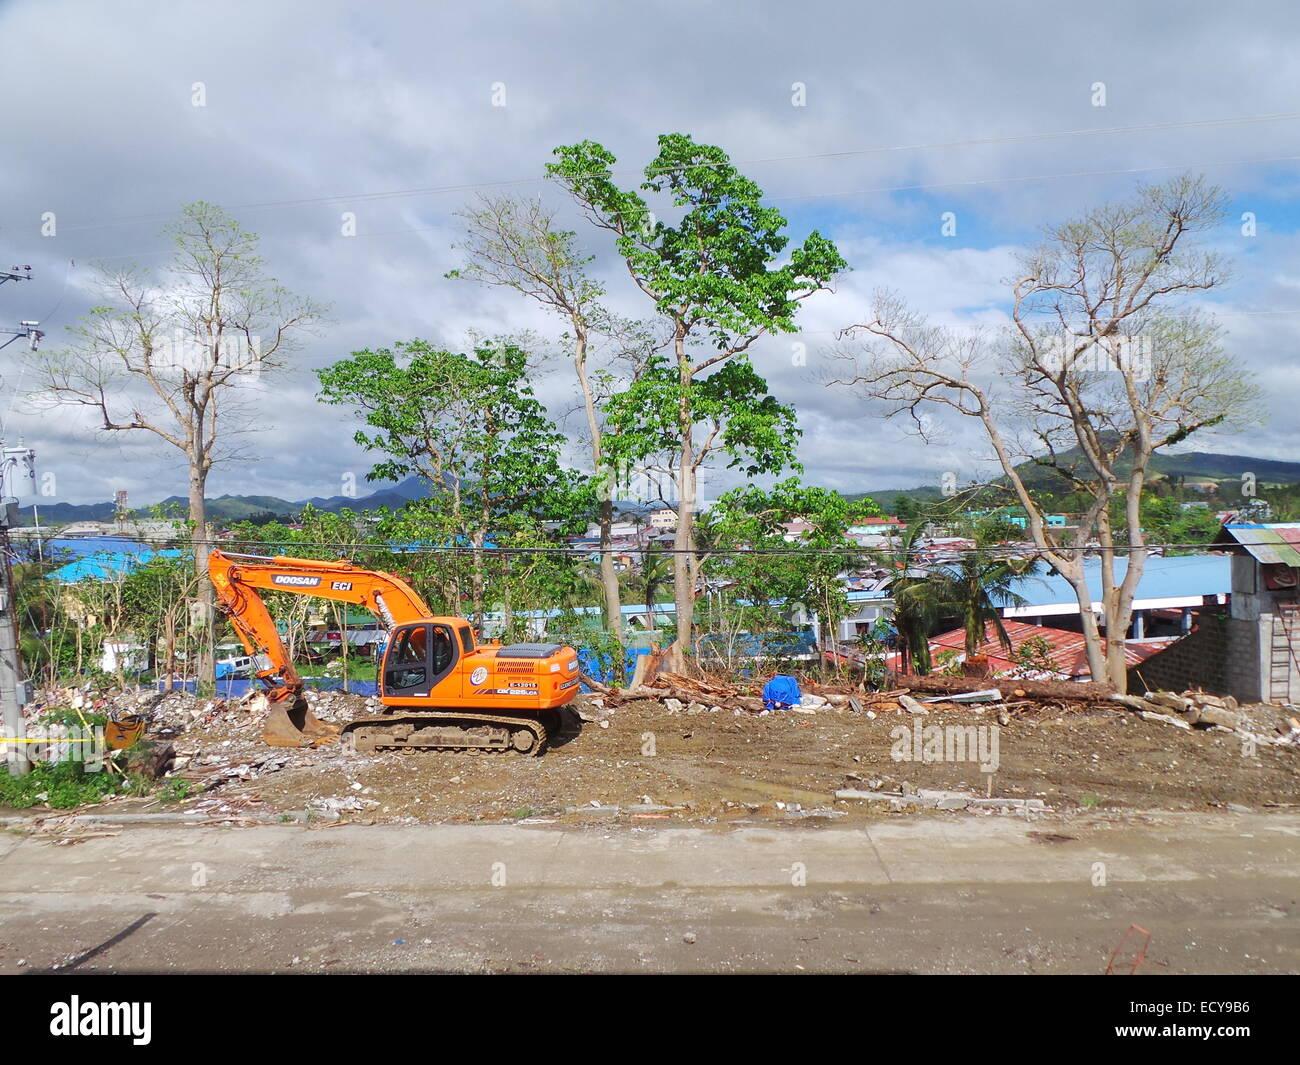 After Typhoon Yolanda, Typhoon Ruby had also damaged some